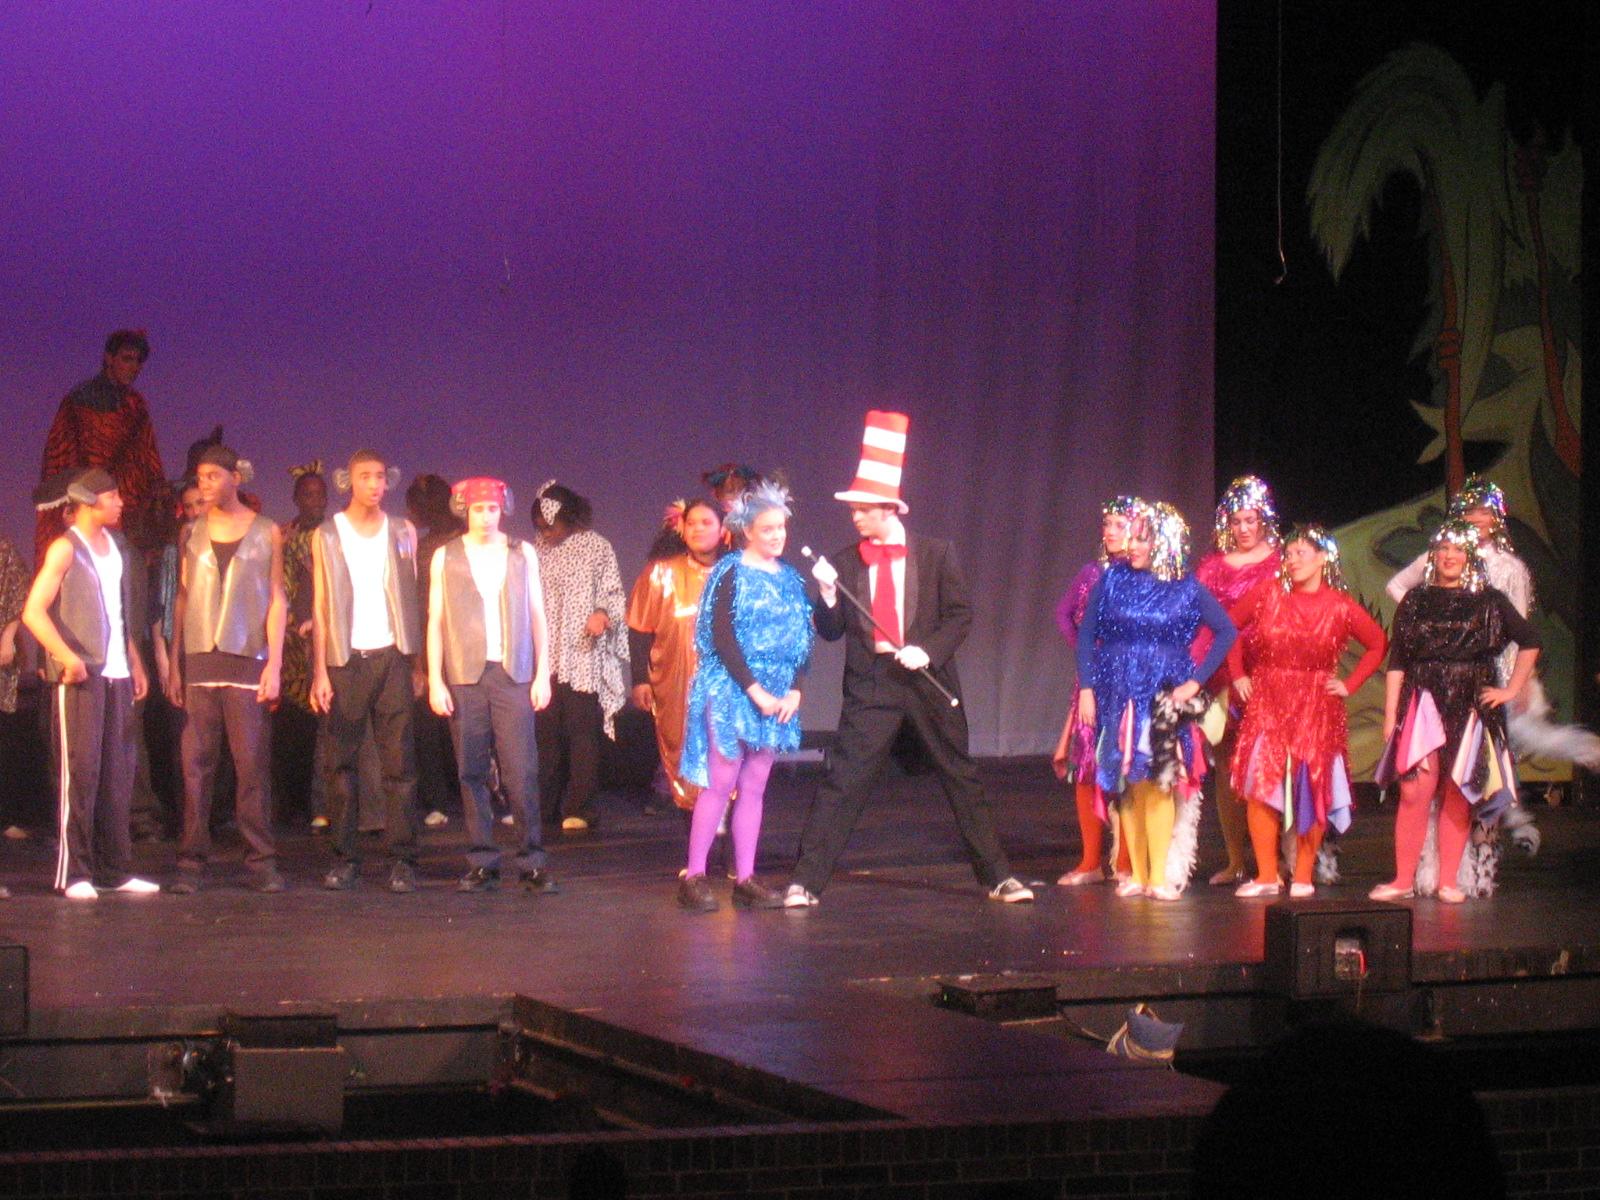 Cat in the Hat (Nolan Buck), Gertrude (Jaclyn Boskamp), bird girls, and the Wickershams